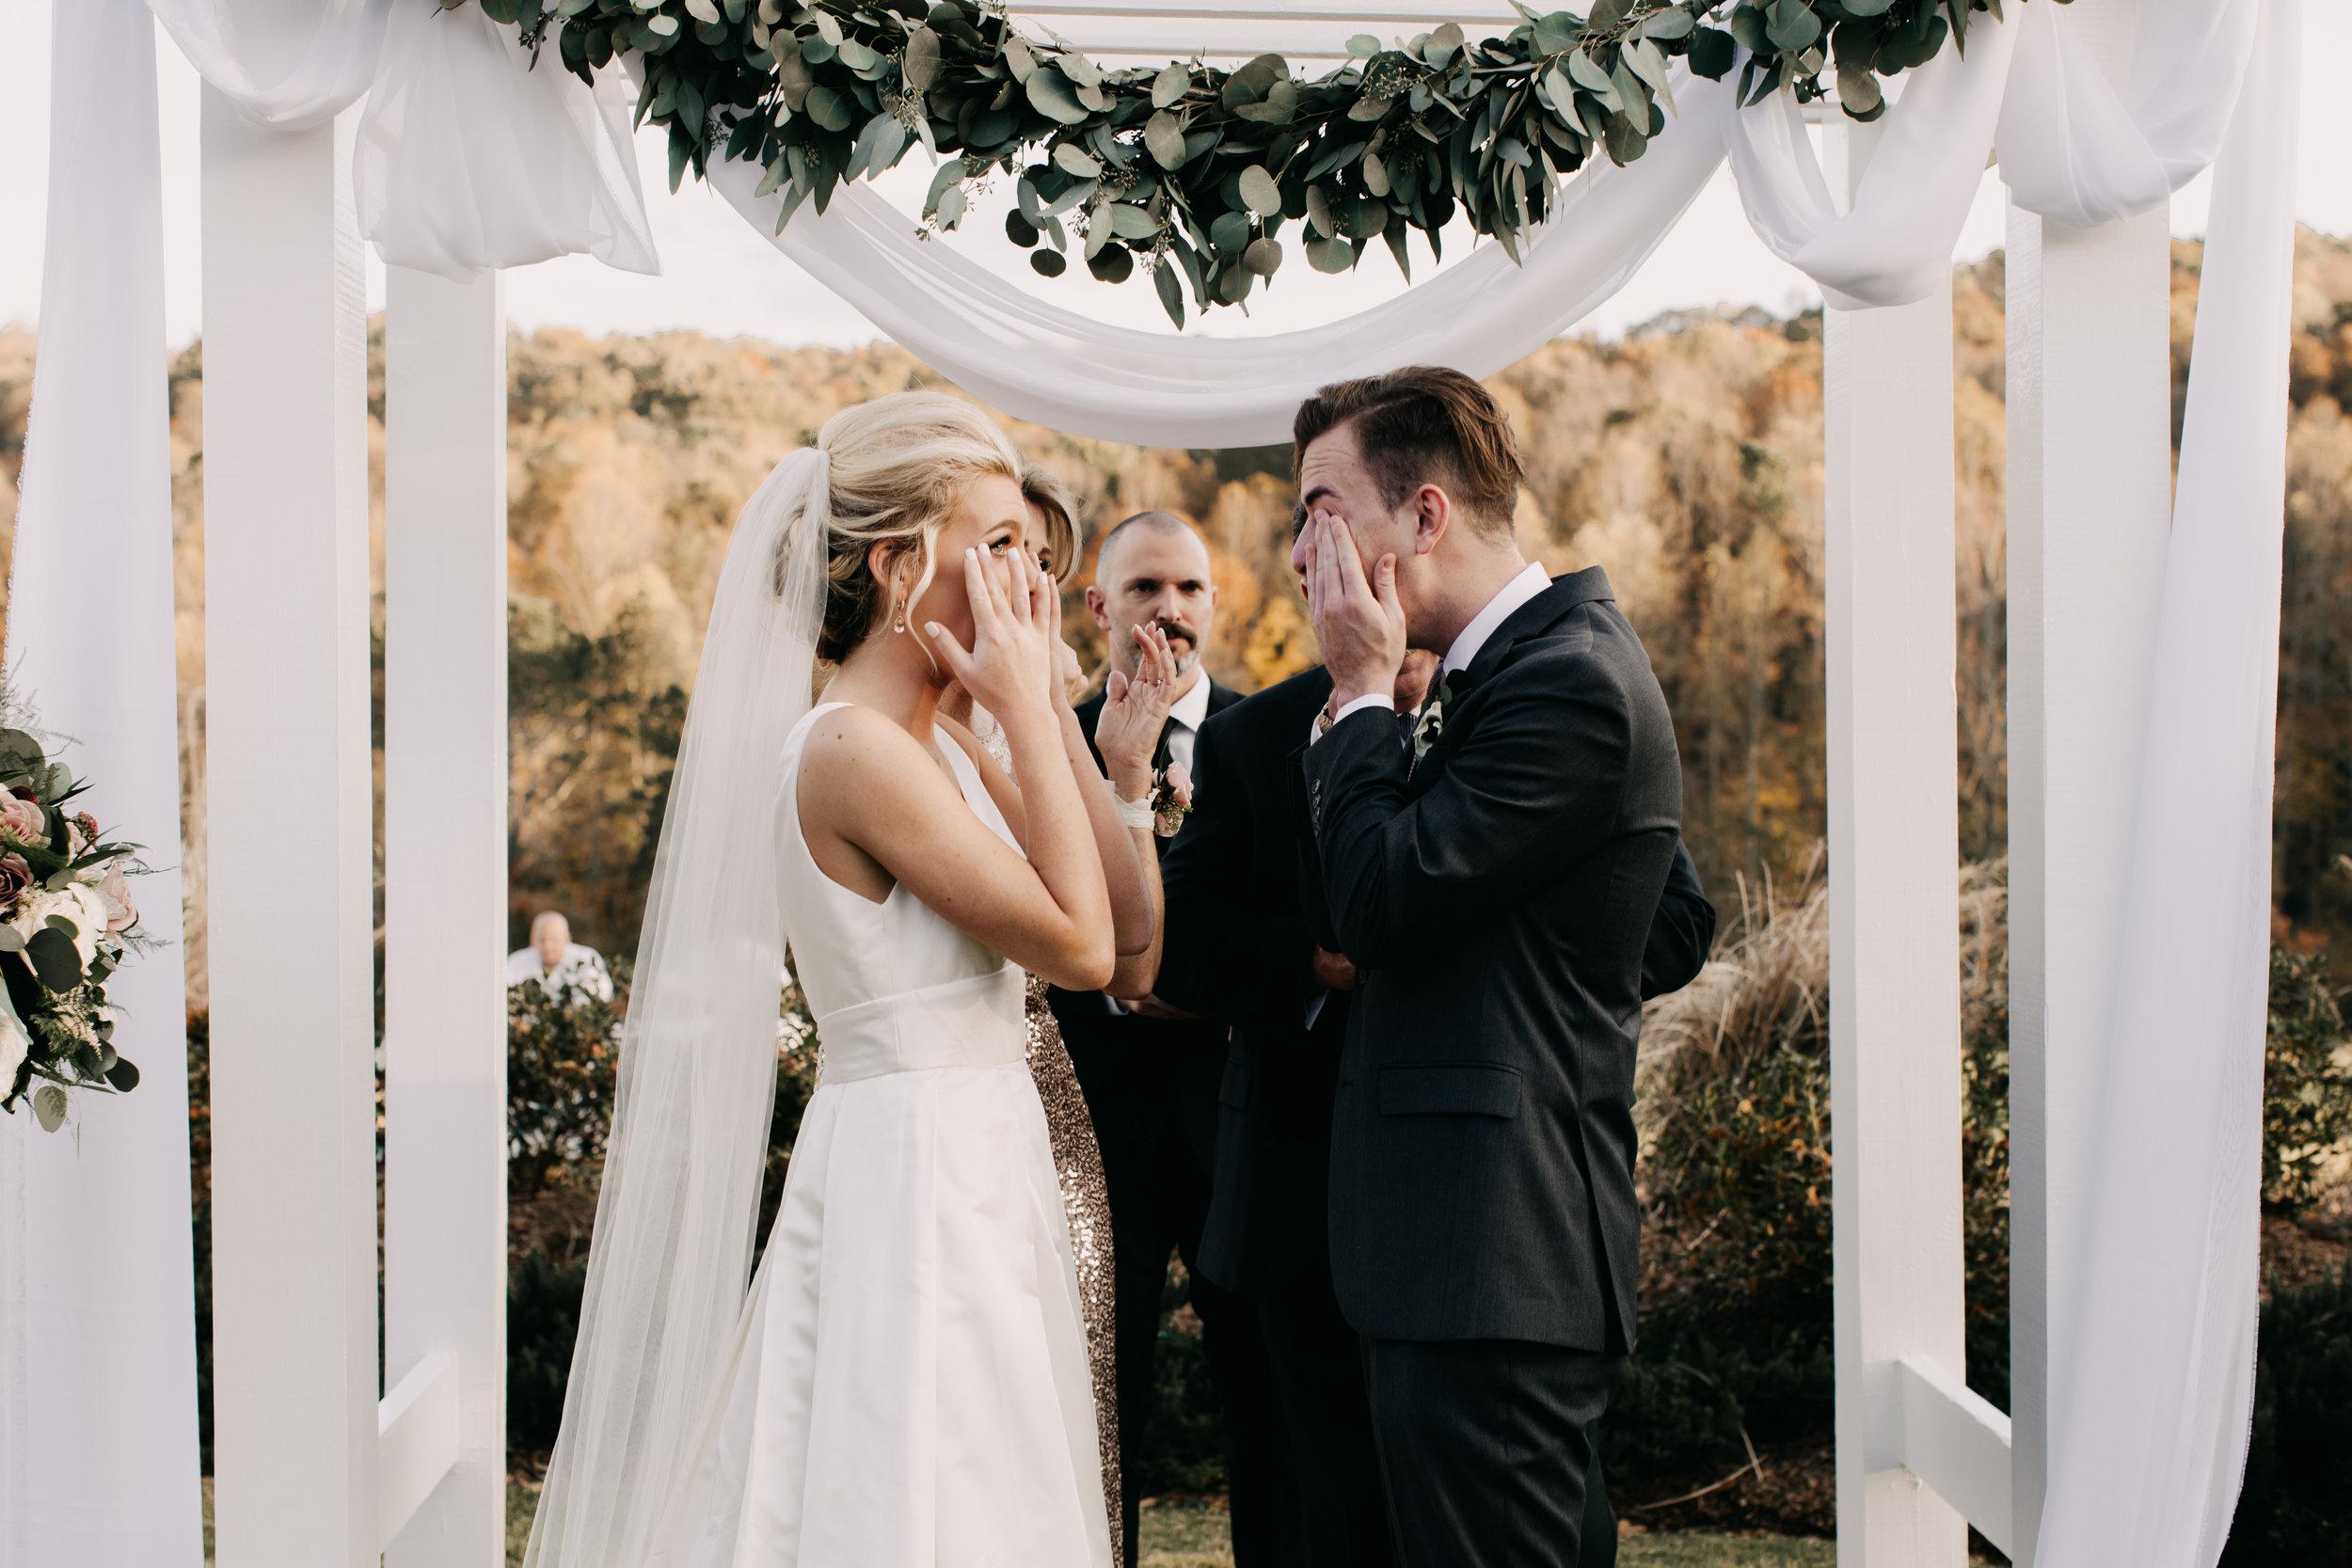 Kaylyn & Ryan Final Wedding Photos343.jpg